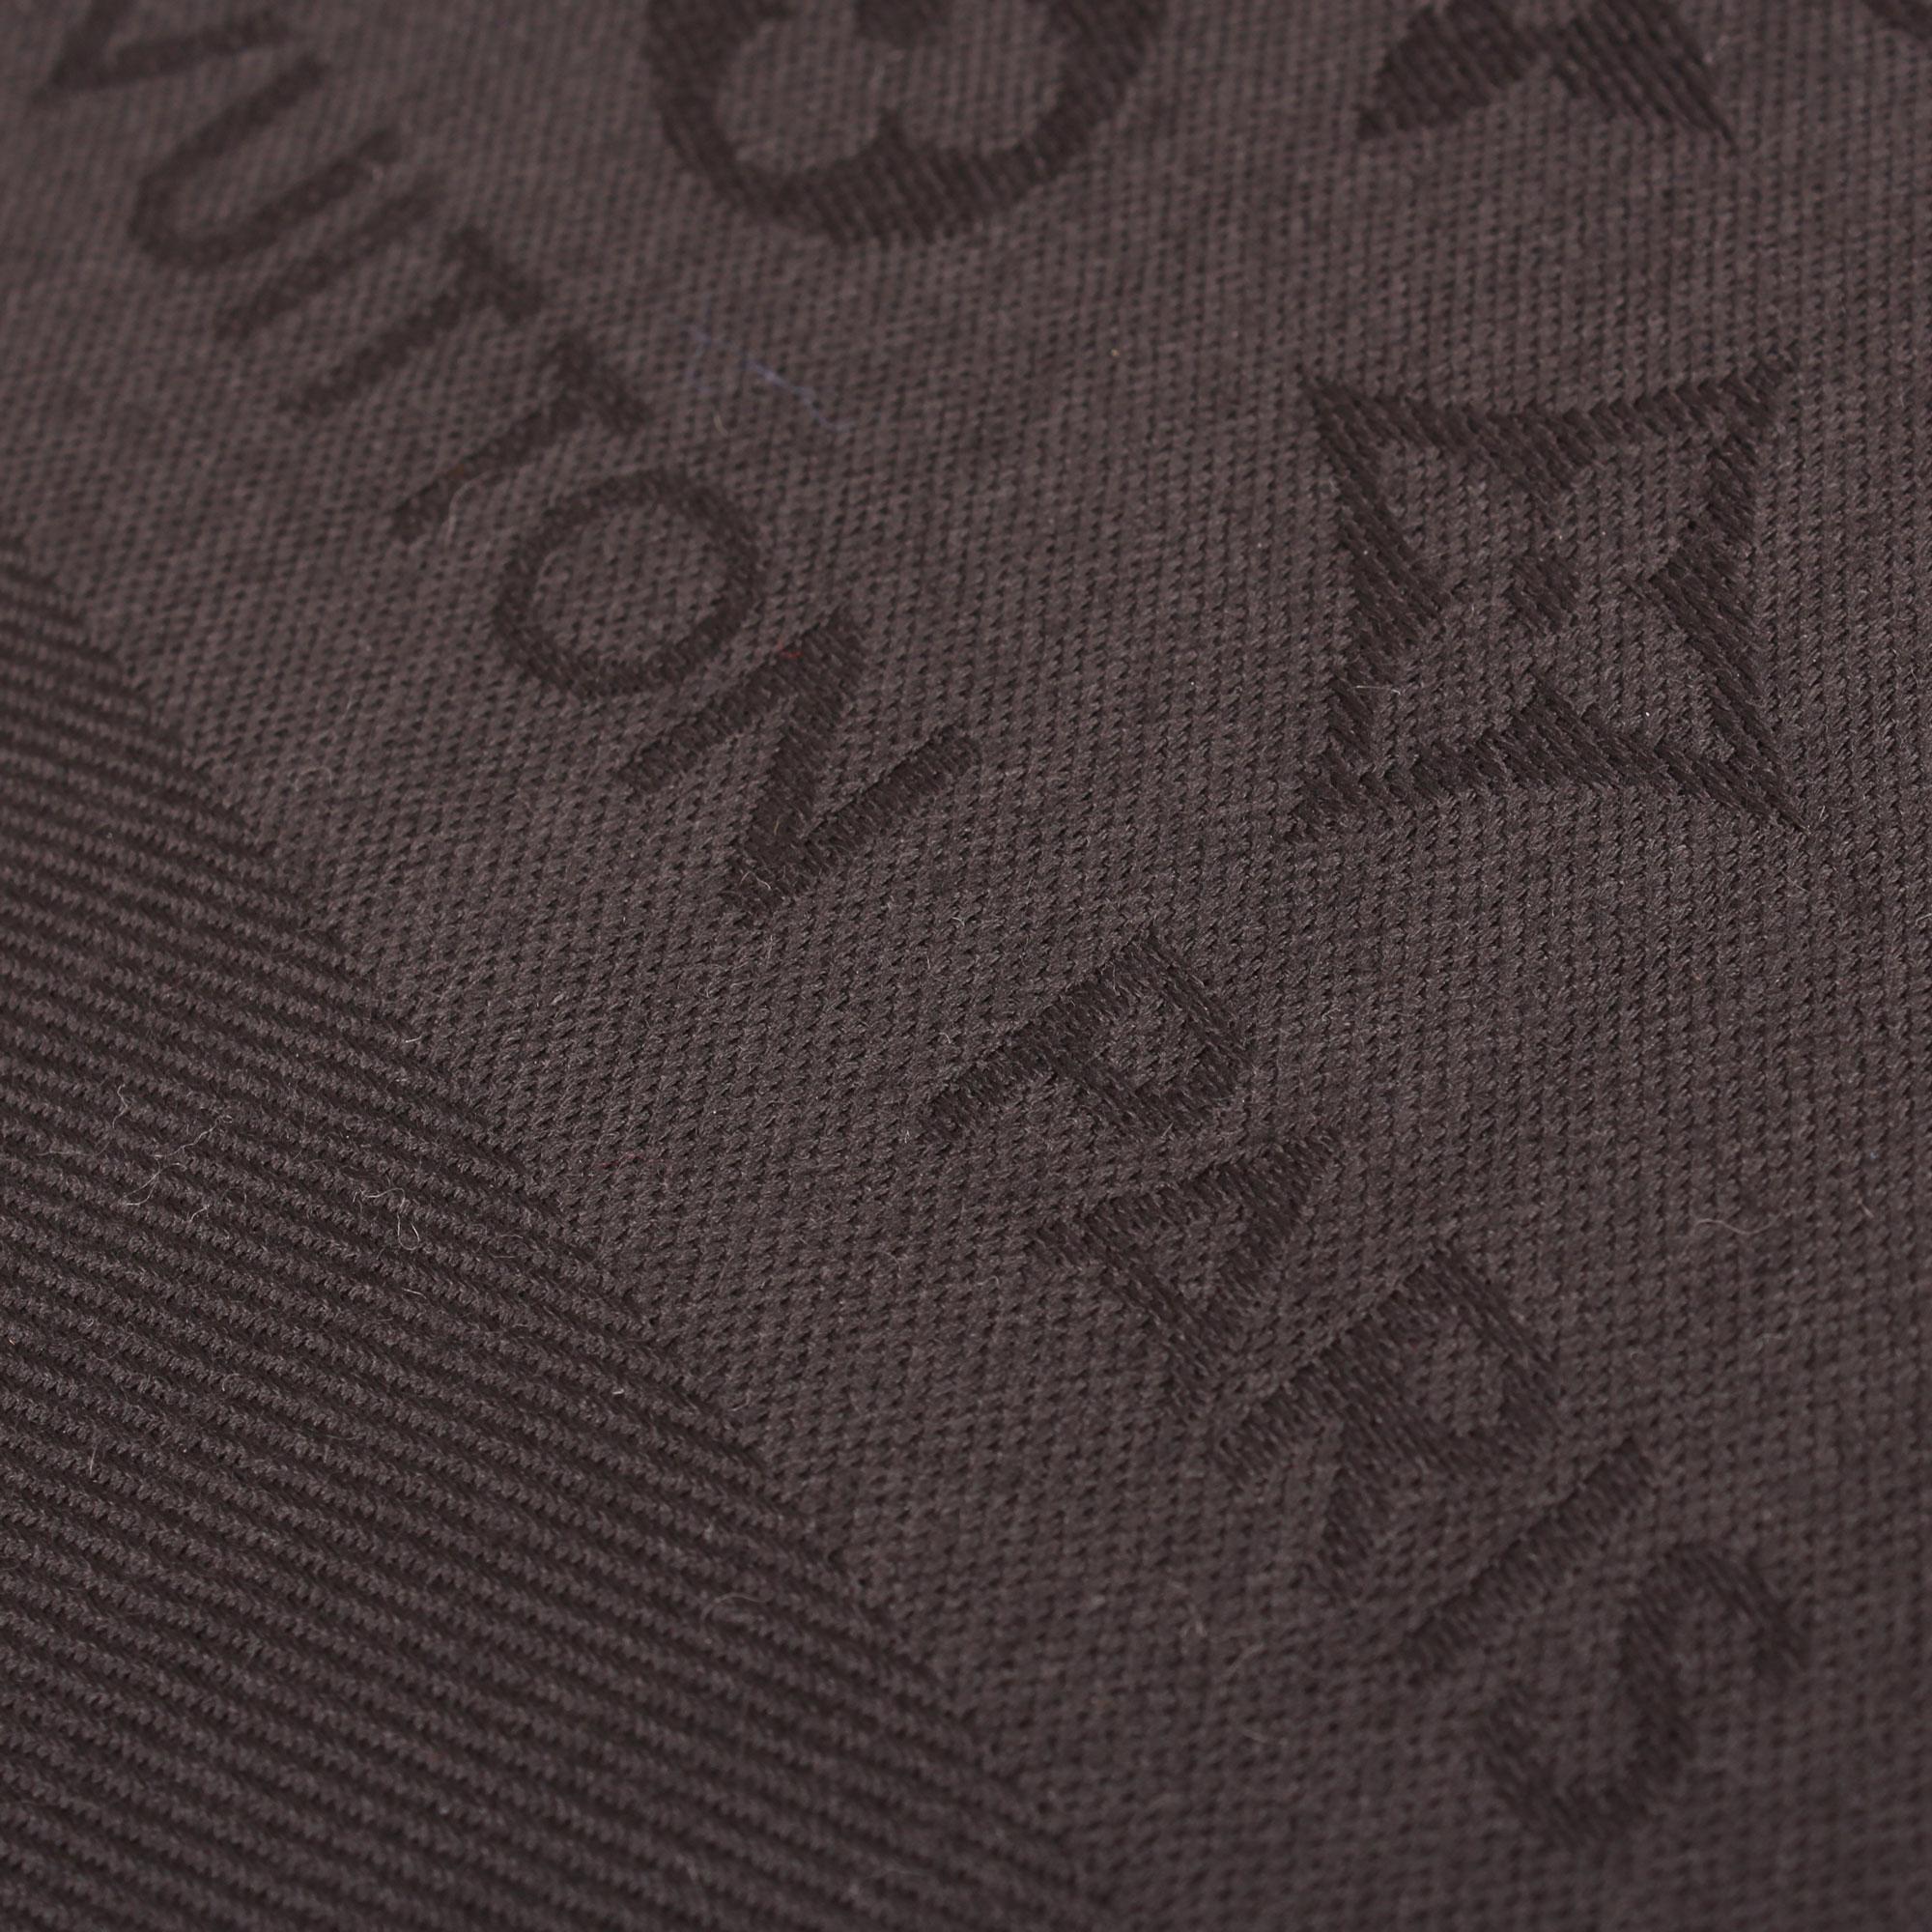 chal-louis-vuitton-monogram-negro-detalle